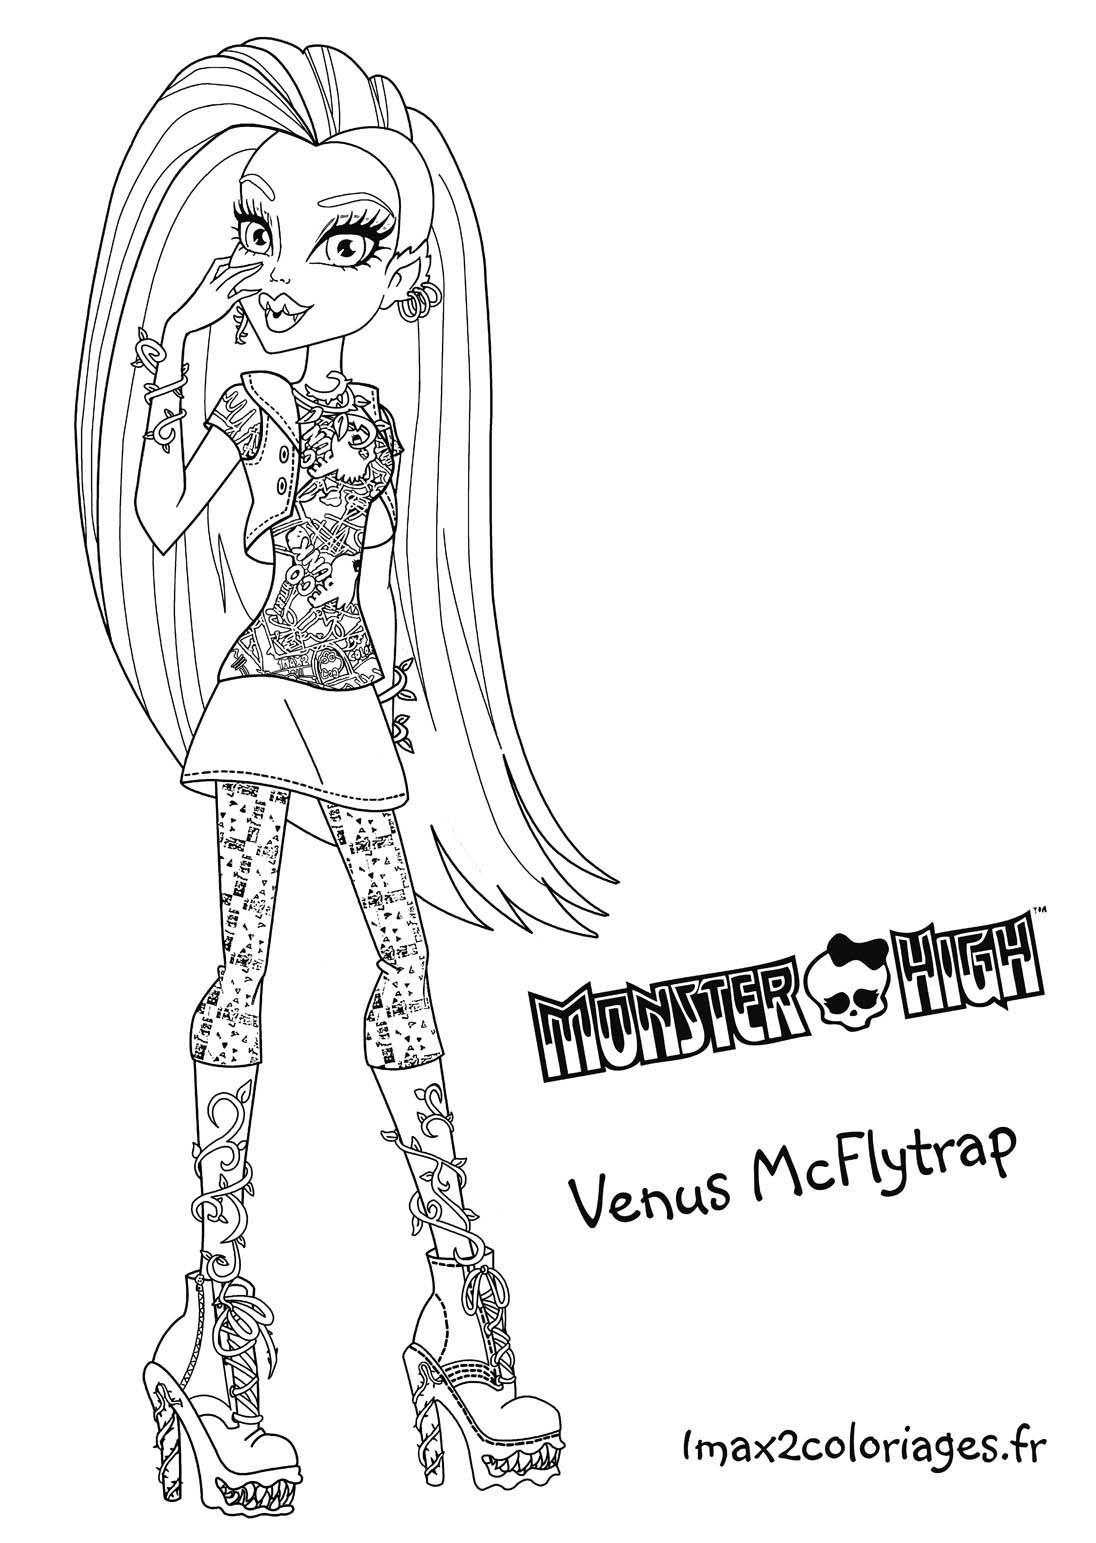 coloriage venus mcflytrap grande image monster highteenagersmonsterscoloring pages - Coloring Pages Monster High Venus